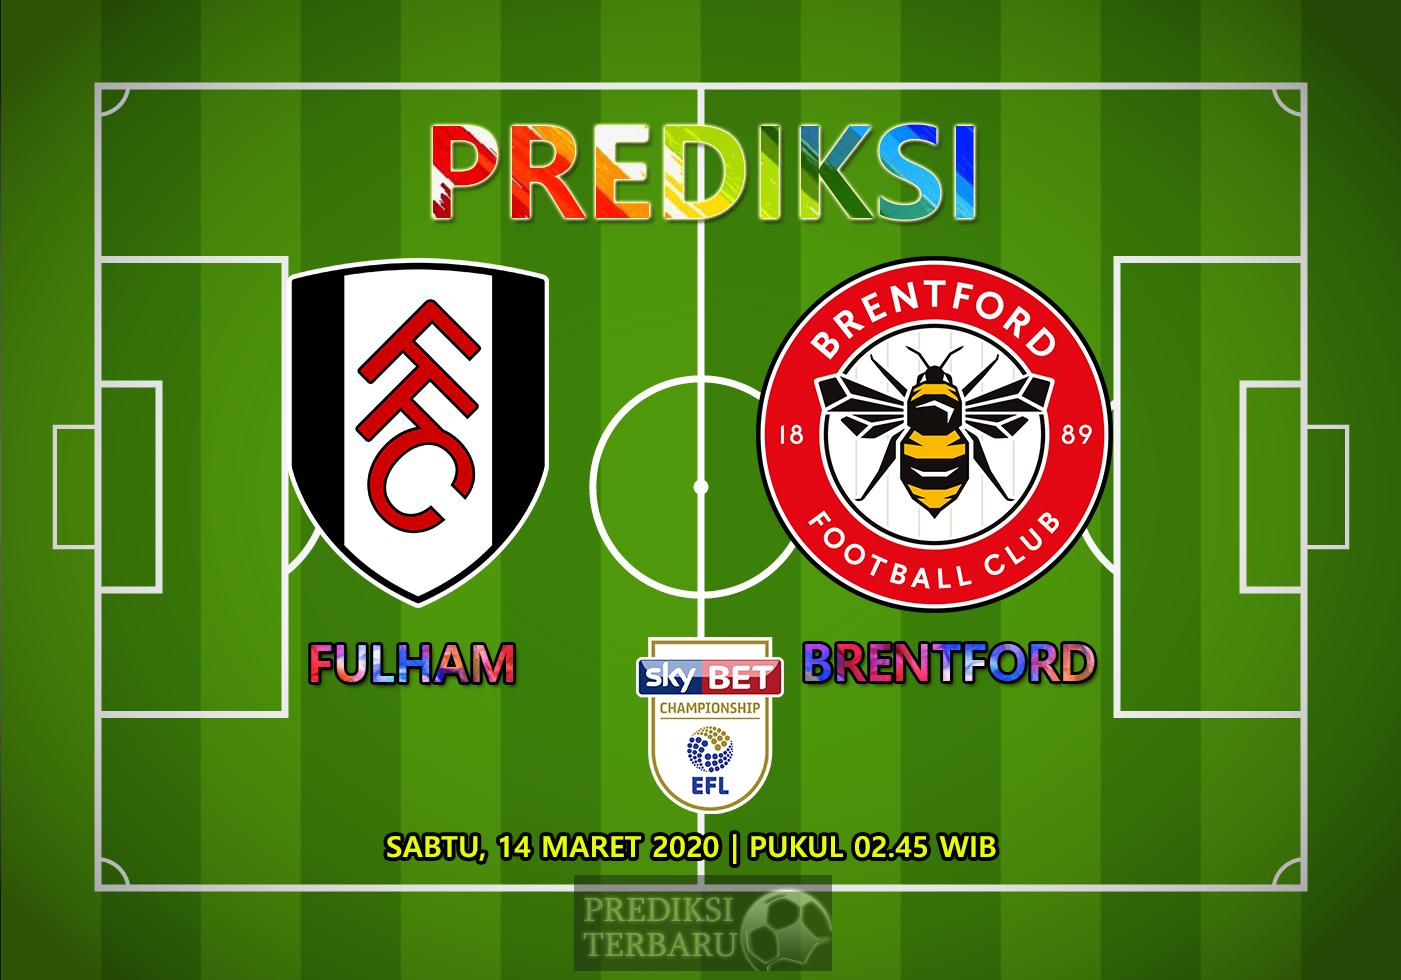 Prediksi Fulham Vs Brentford Sabtu 14 Maret